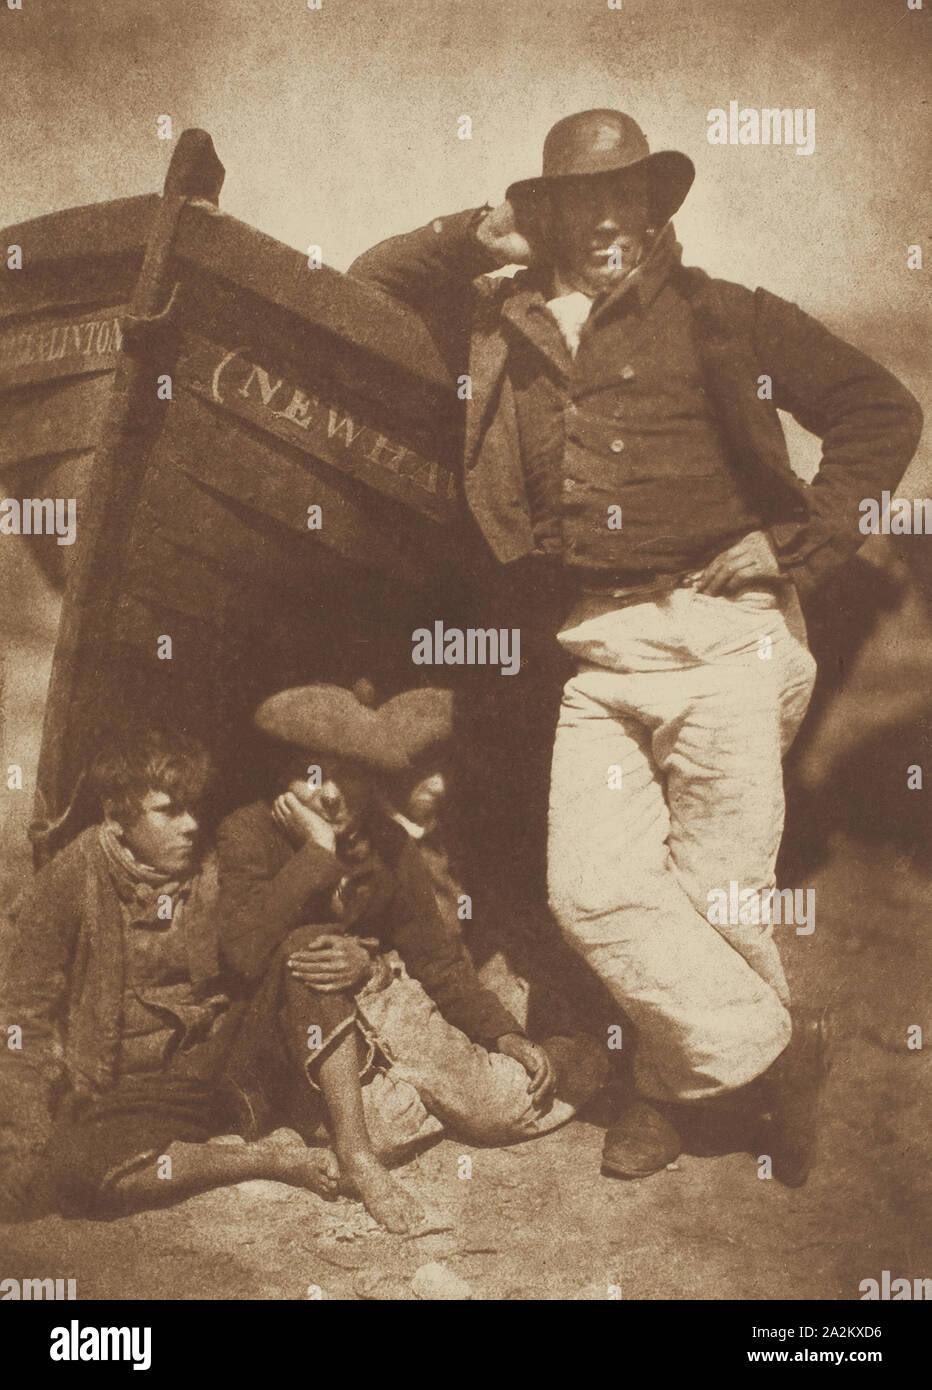 POSTERS Coche fúnebre del cartel de la película 28 cm x43cm